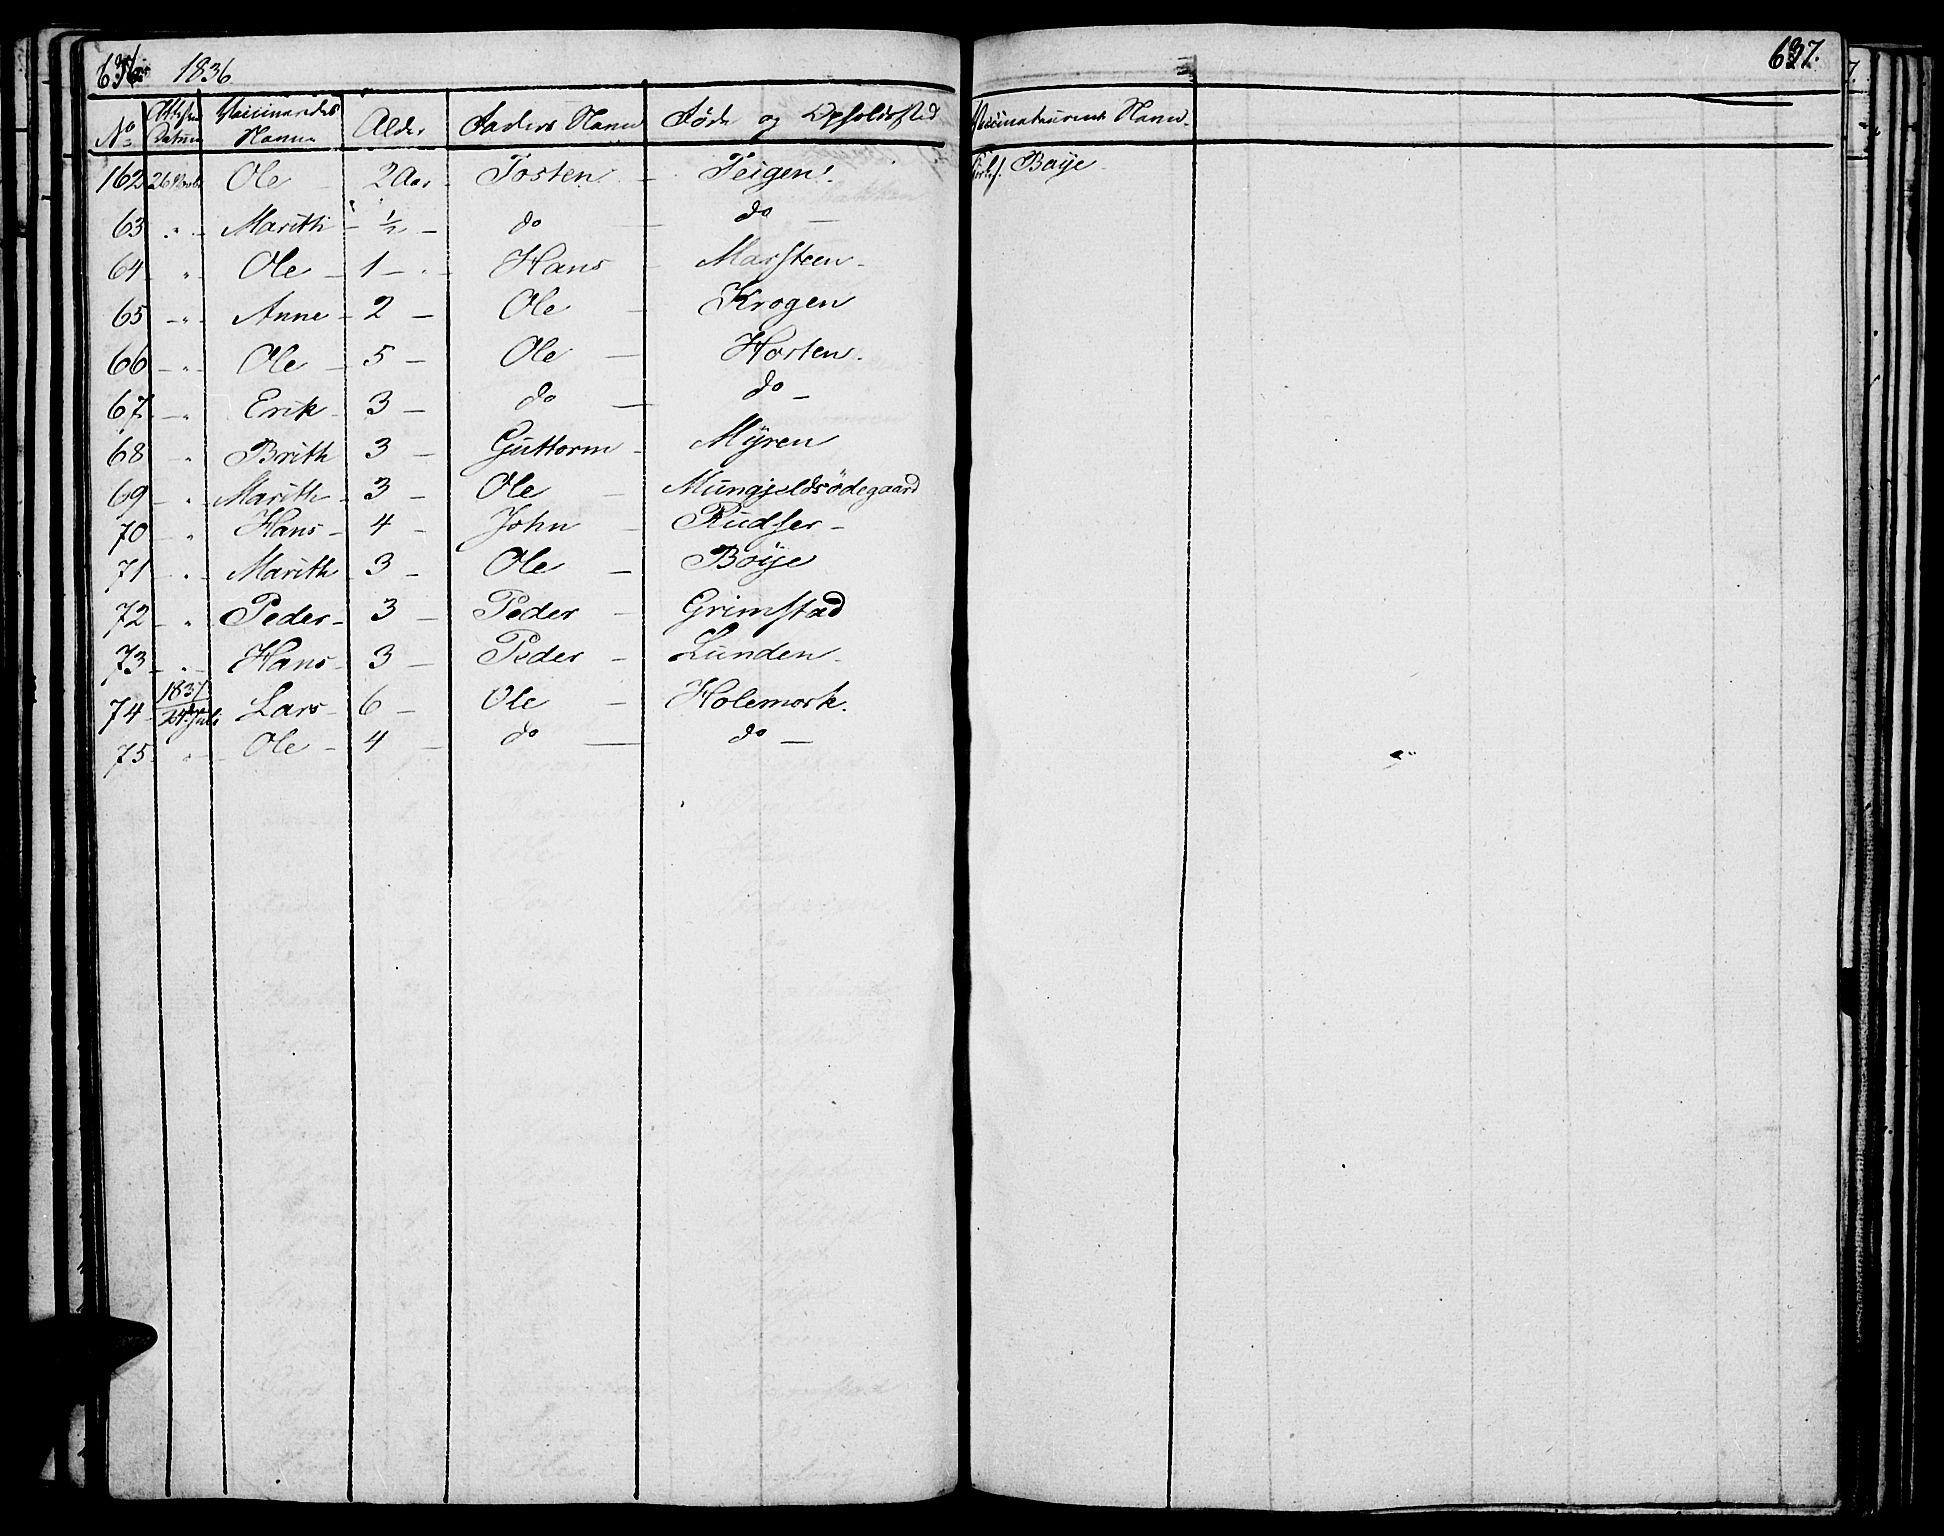 SAH, Lom prestekontor, K/L0005: Parish register (official) no. 5, 1825-1837, p. 636-637